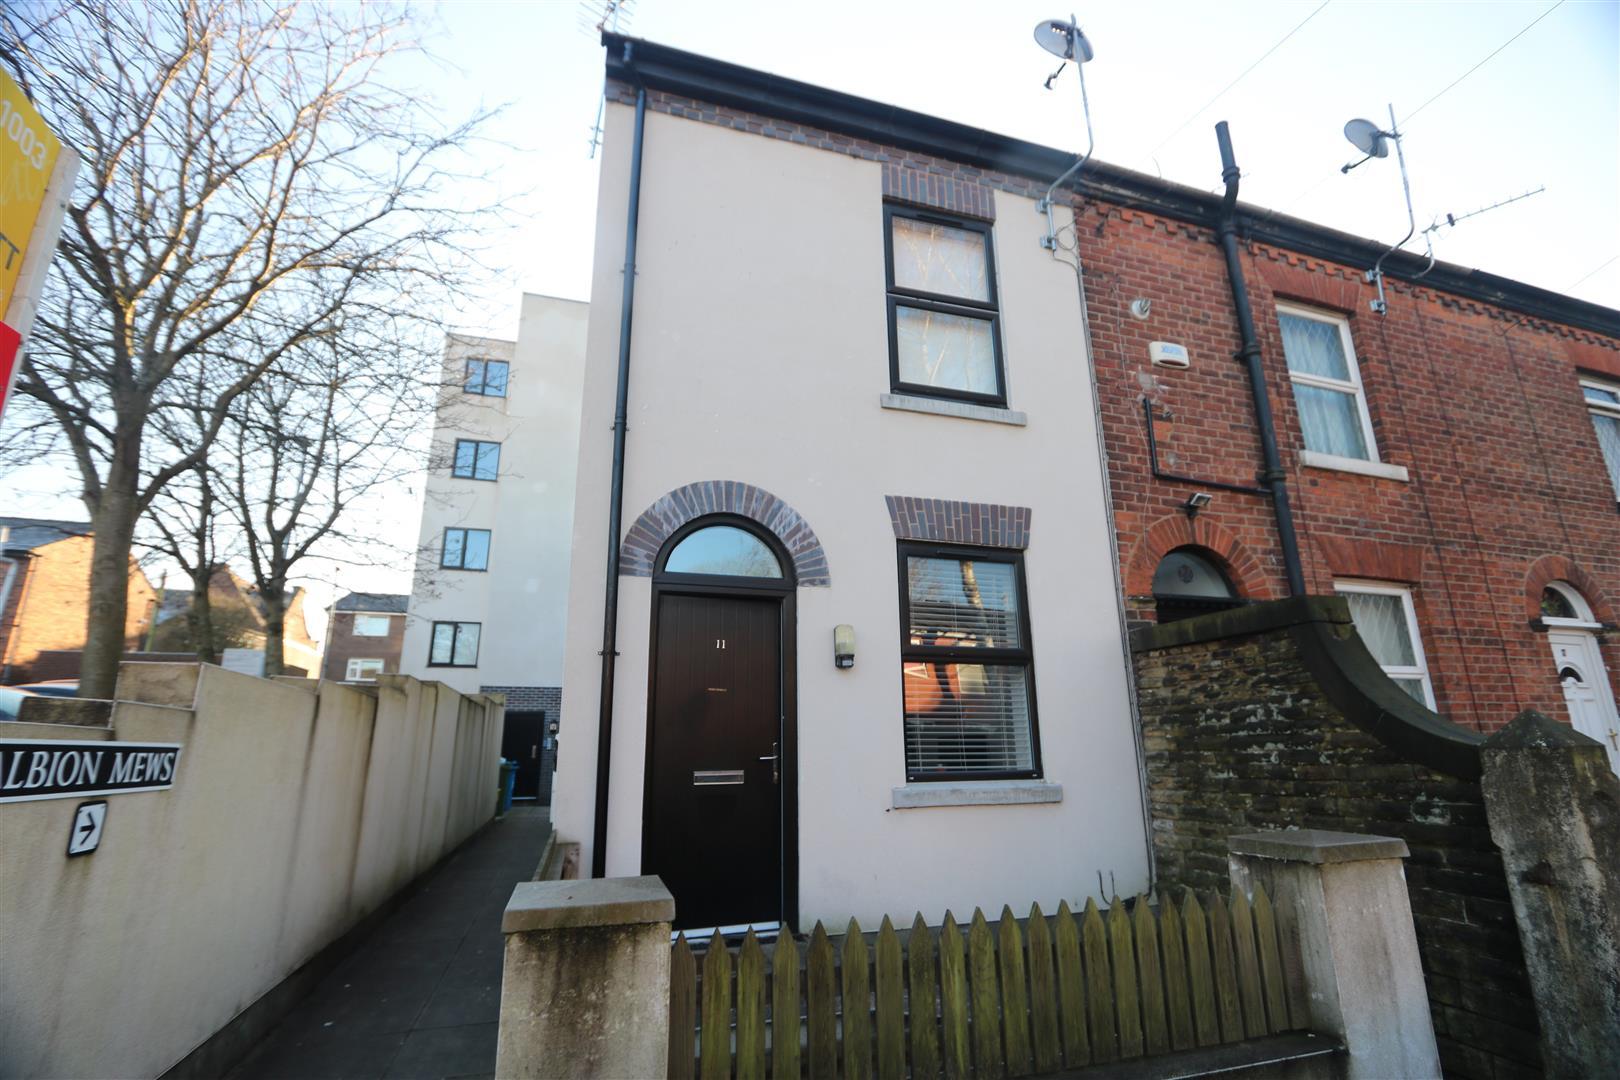 11 Clifton Road, Prestwich